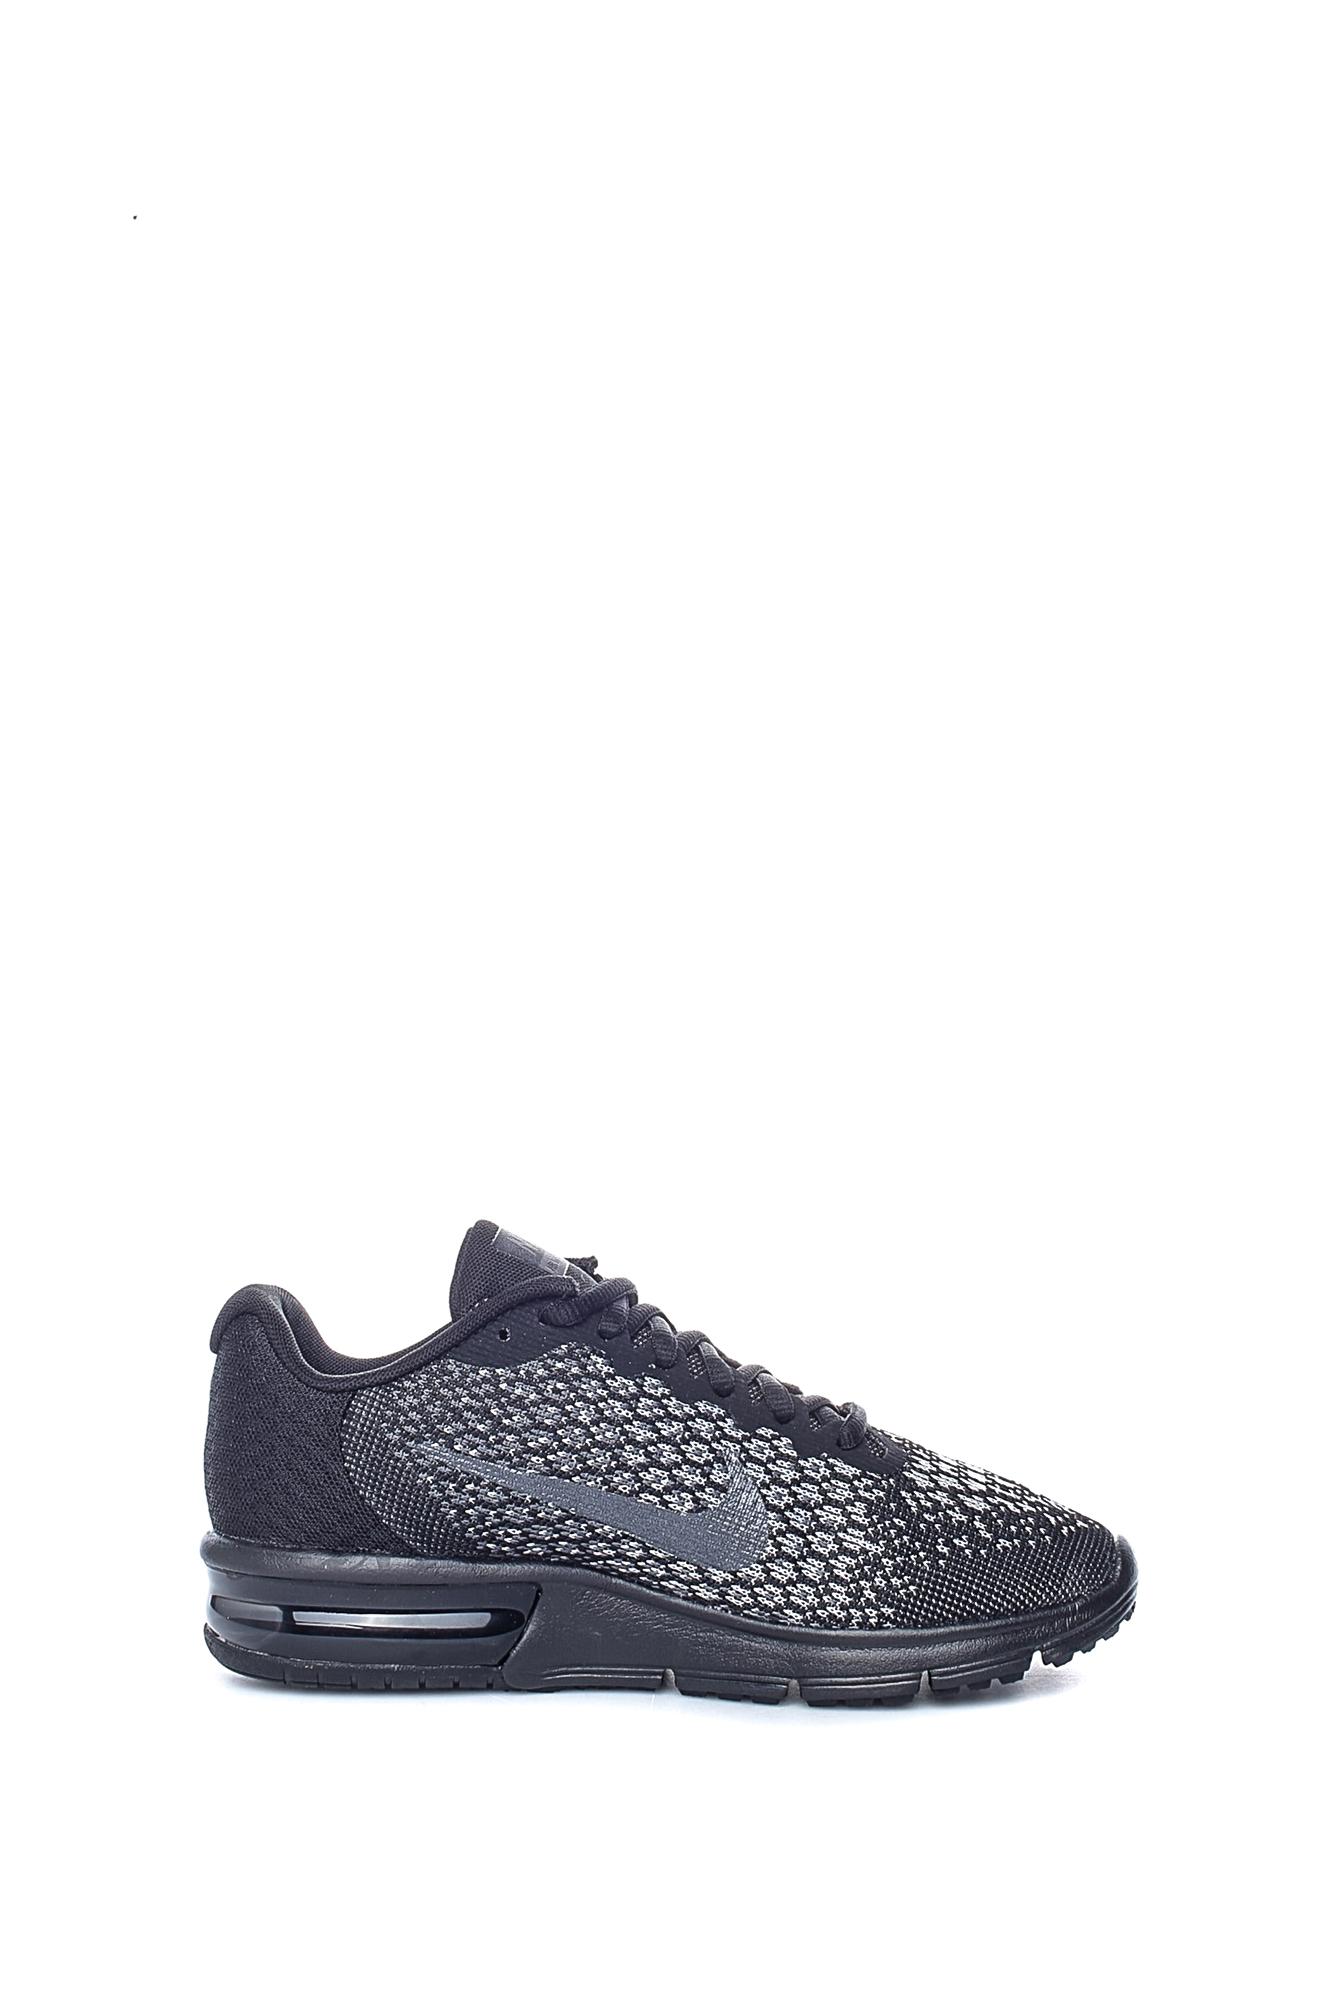 NIKE – Γυναικεία αθλητικά παπούτσια Nike AIR MAX SEQUENT 2 μαύρα – λευκά